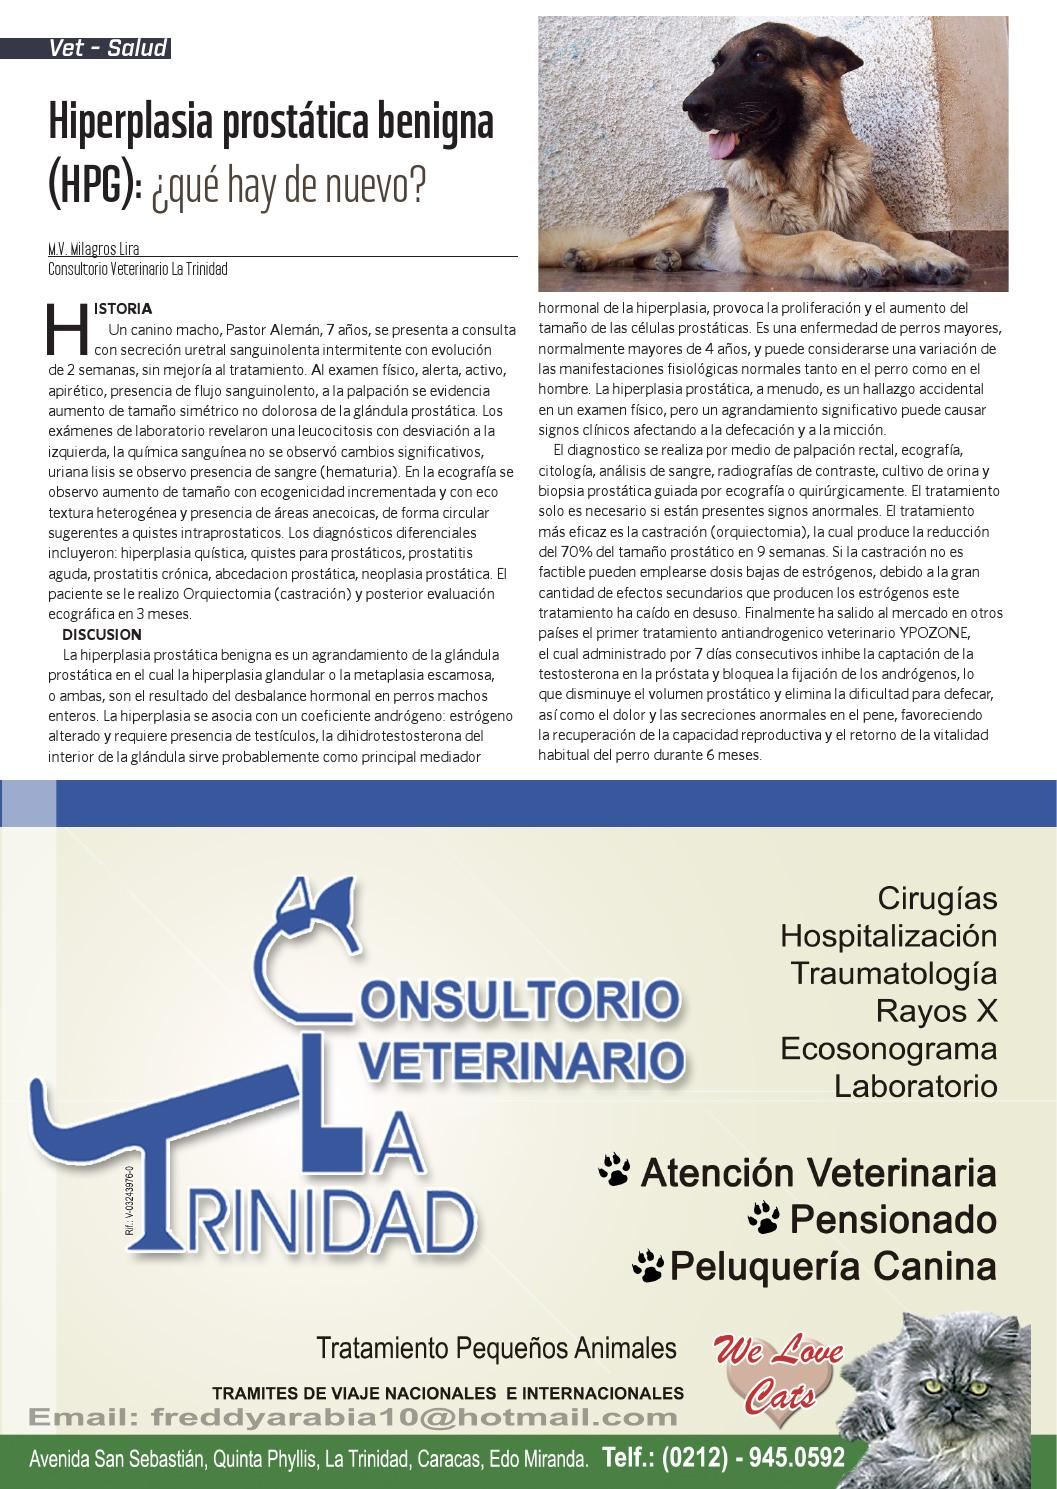 tratamiento de la hiperplasia prostática benigna del perro